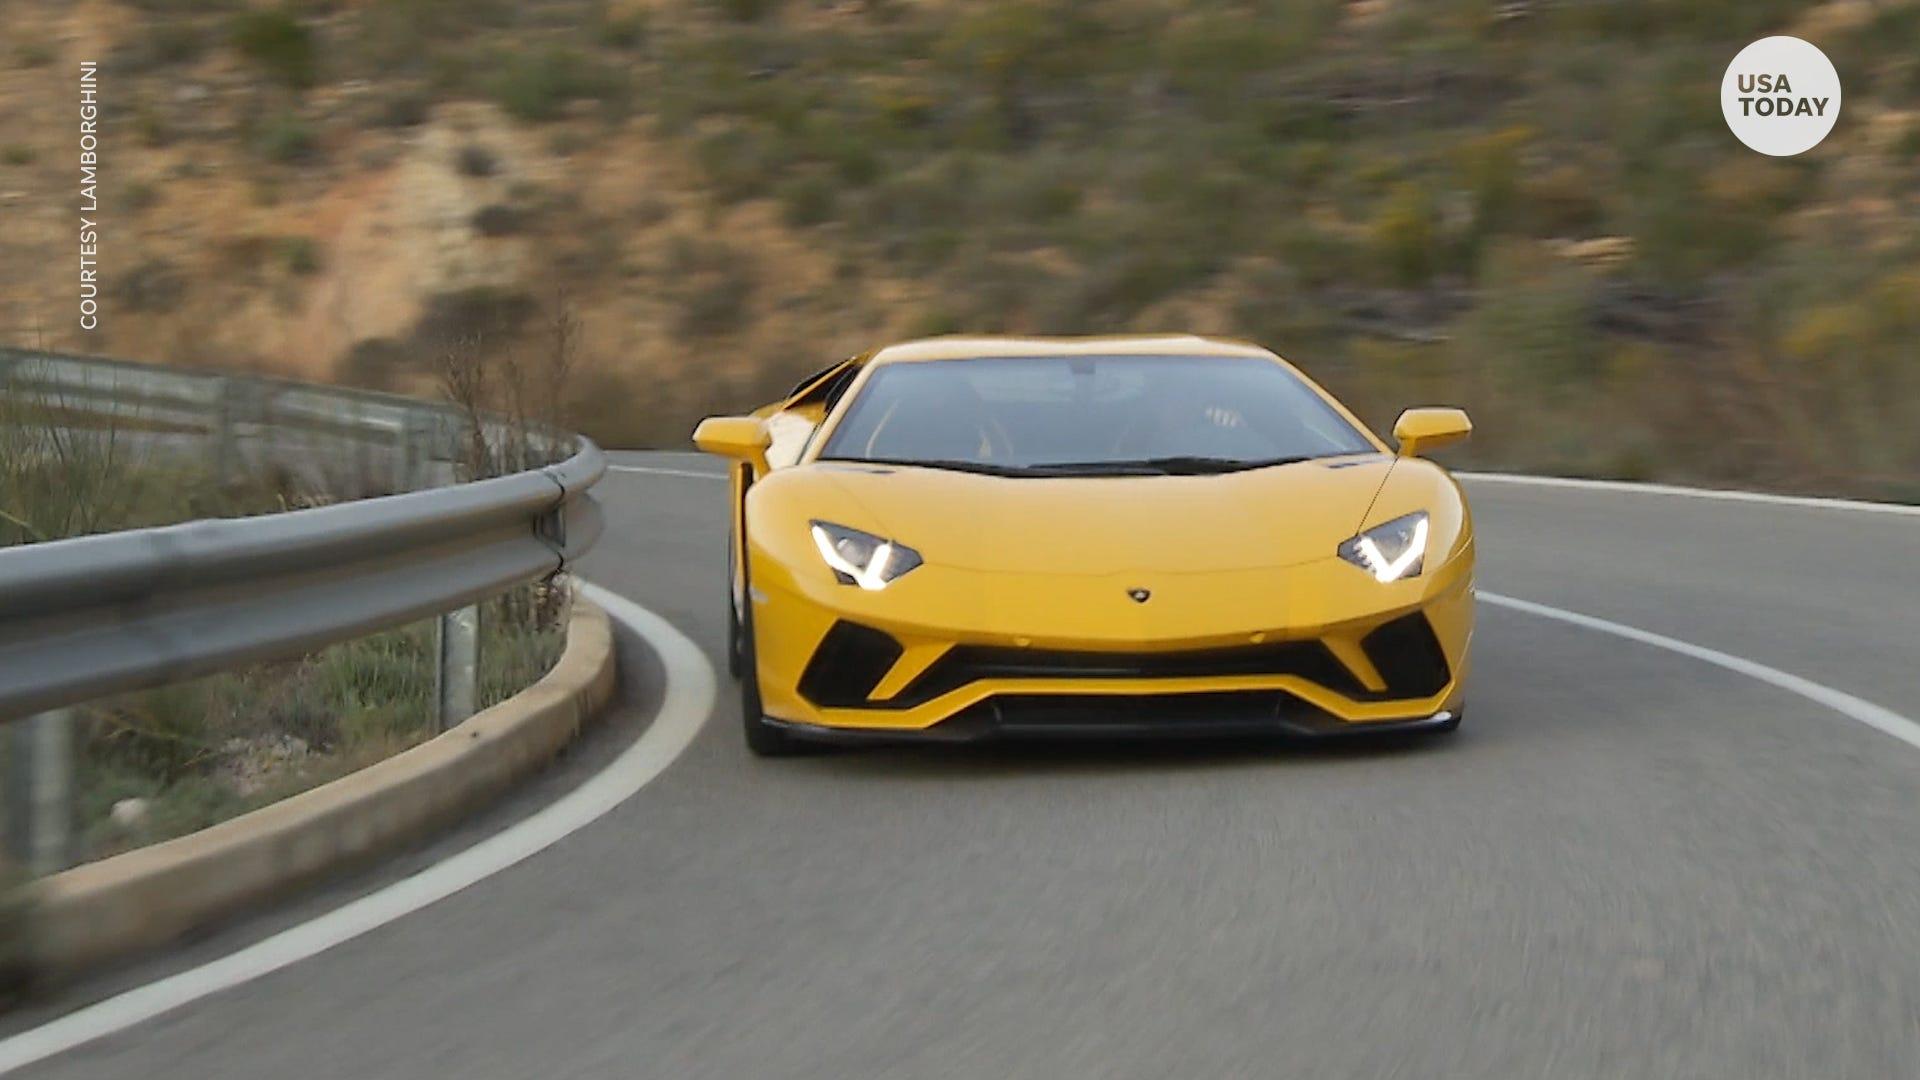 Rolls Royce Aston Martin Lamborghini Ultra Luxury Car Prices Plunge